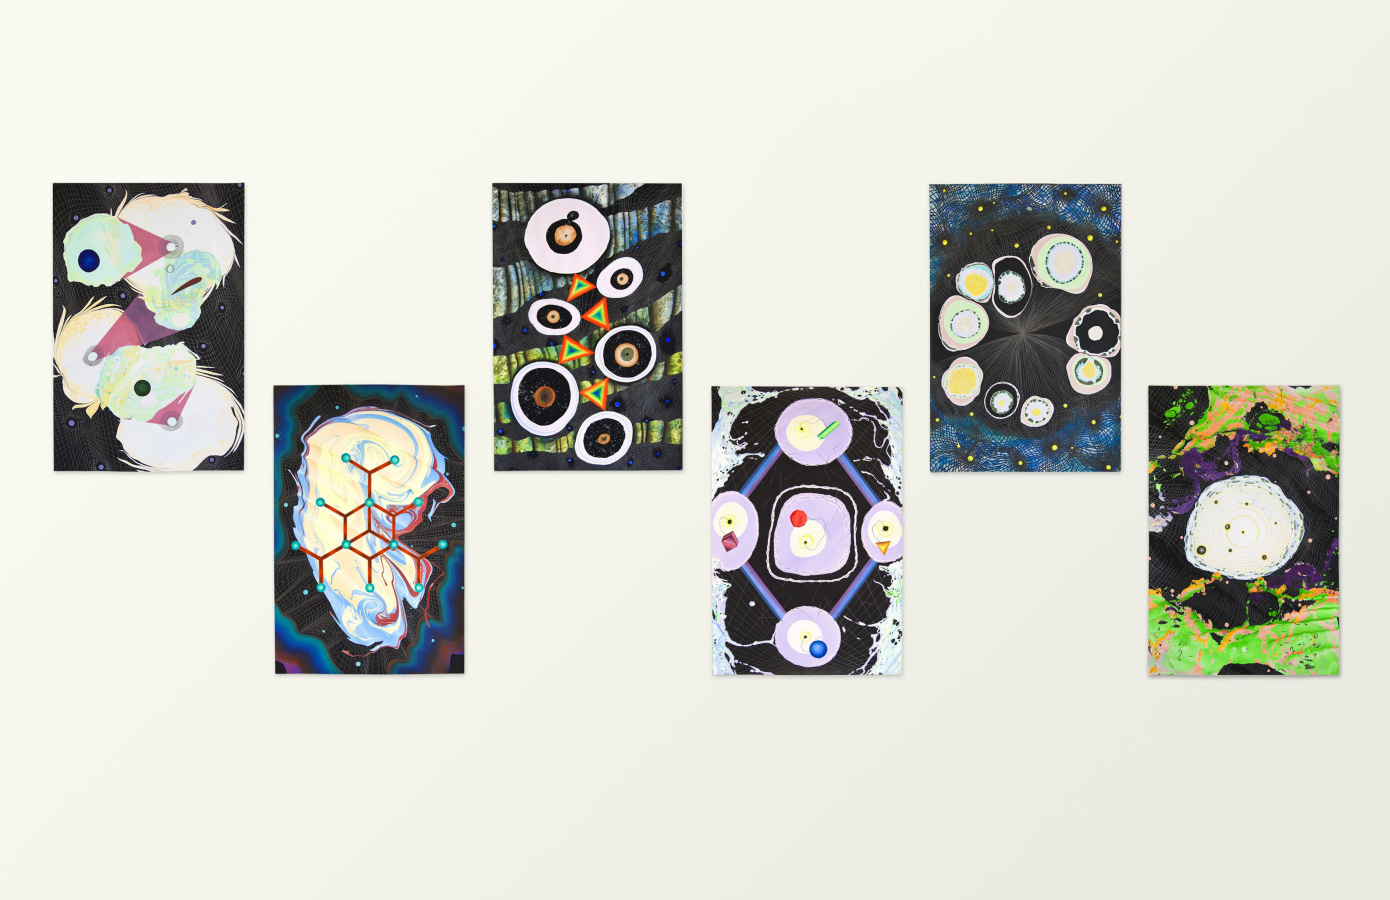 Fabric of Reality, Simone Albers,